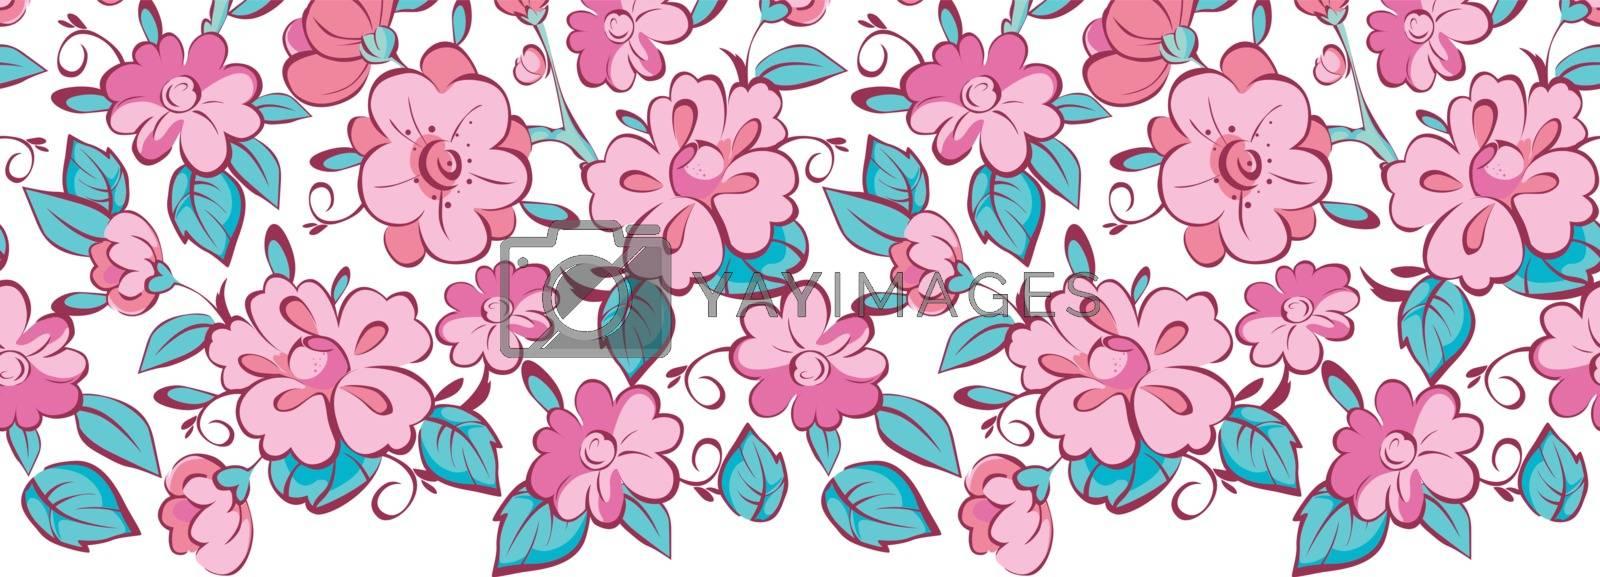 Vector pink blue kimono flowers horizontal border seamless pattern background graphic design